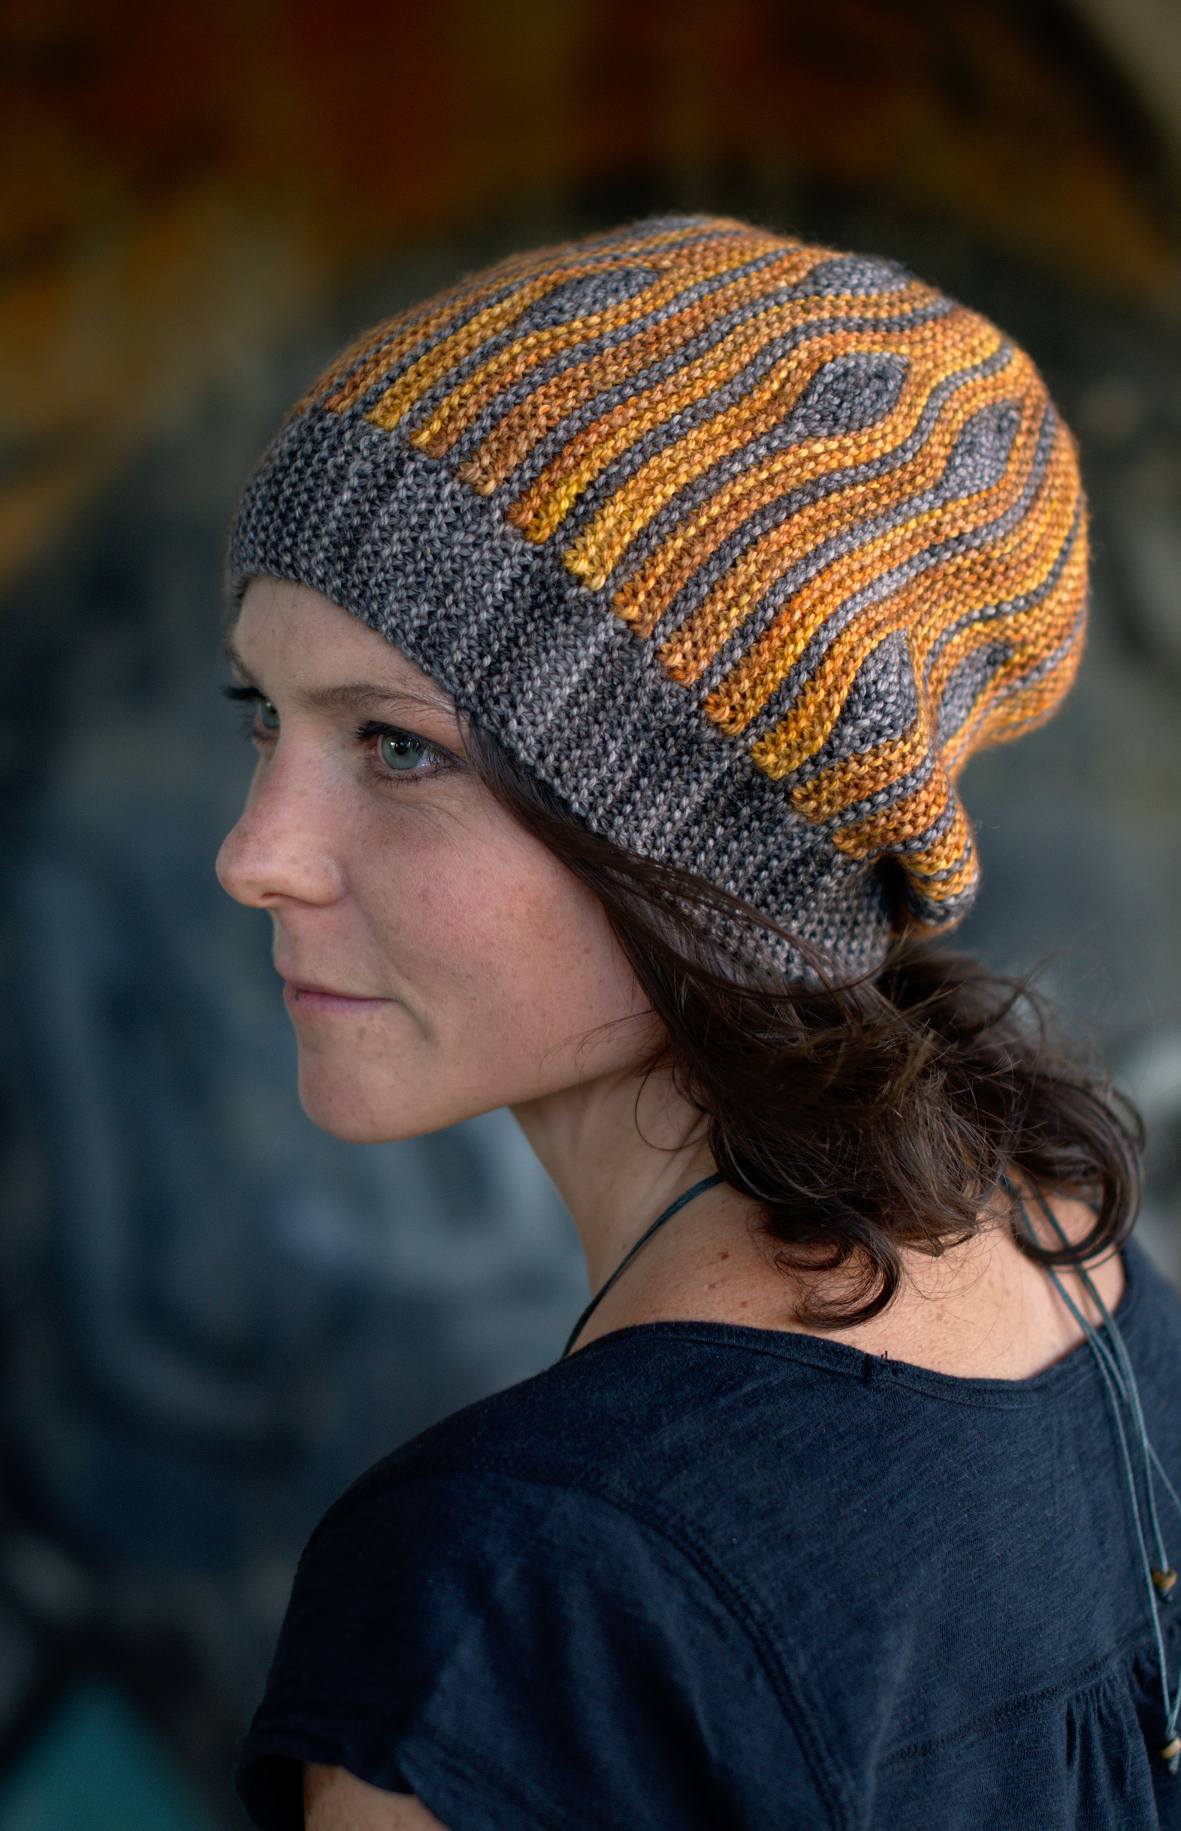 Korra sideways knit short row colourwork Hat knitting pattern